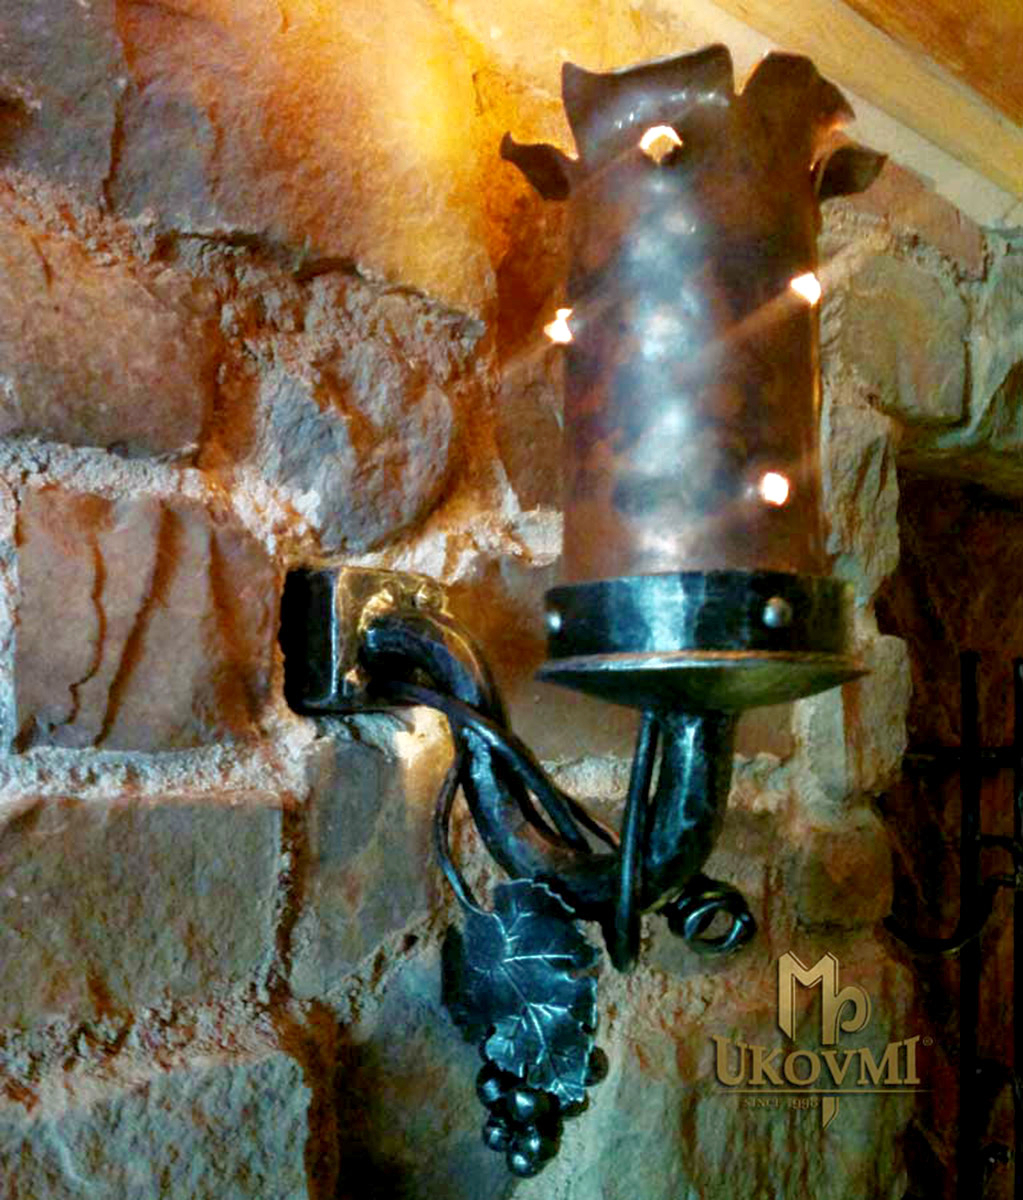 Geschmiedete Wandleuchte aus getriebenem Kupfer – historische Lampe